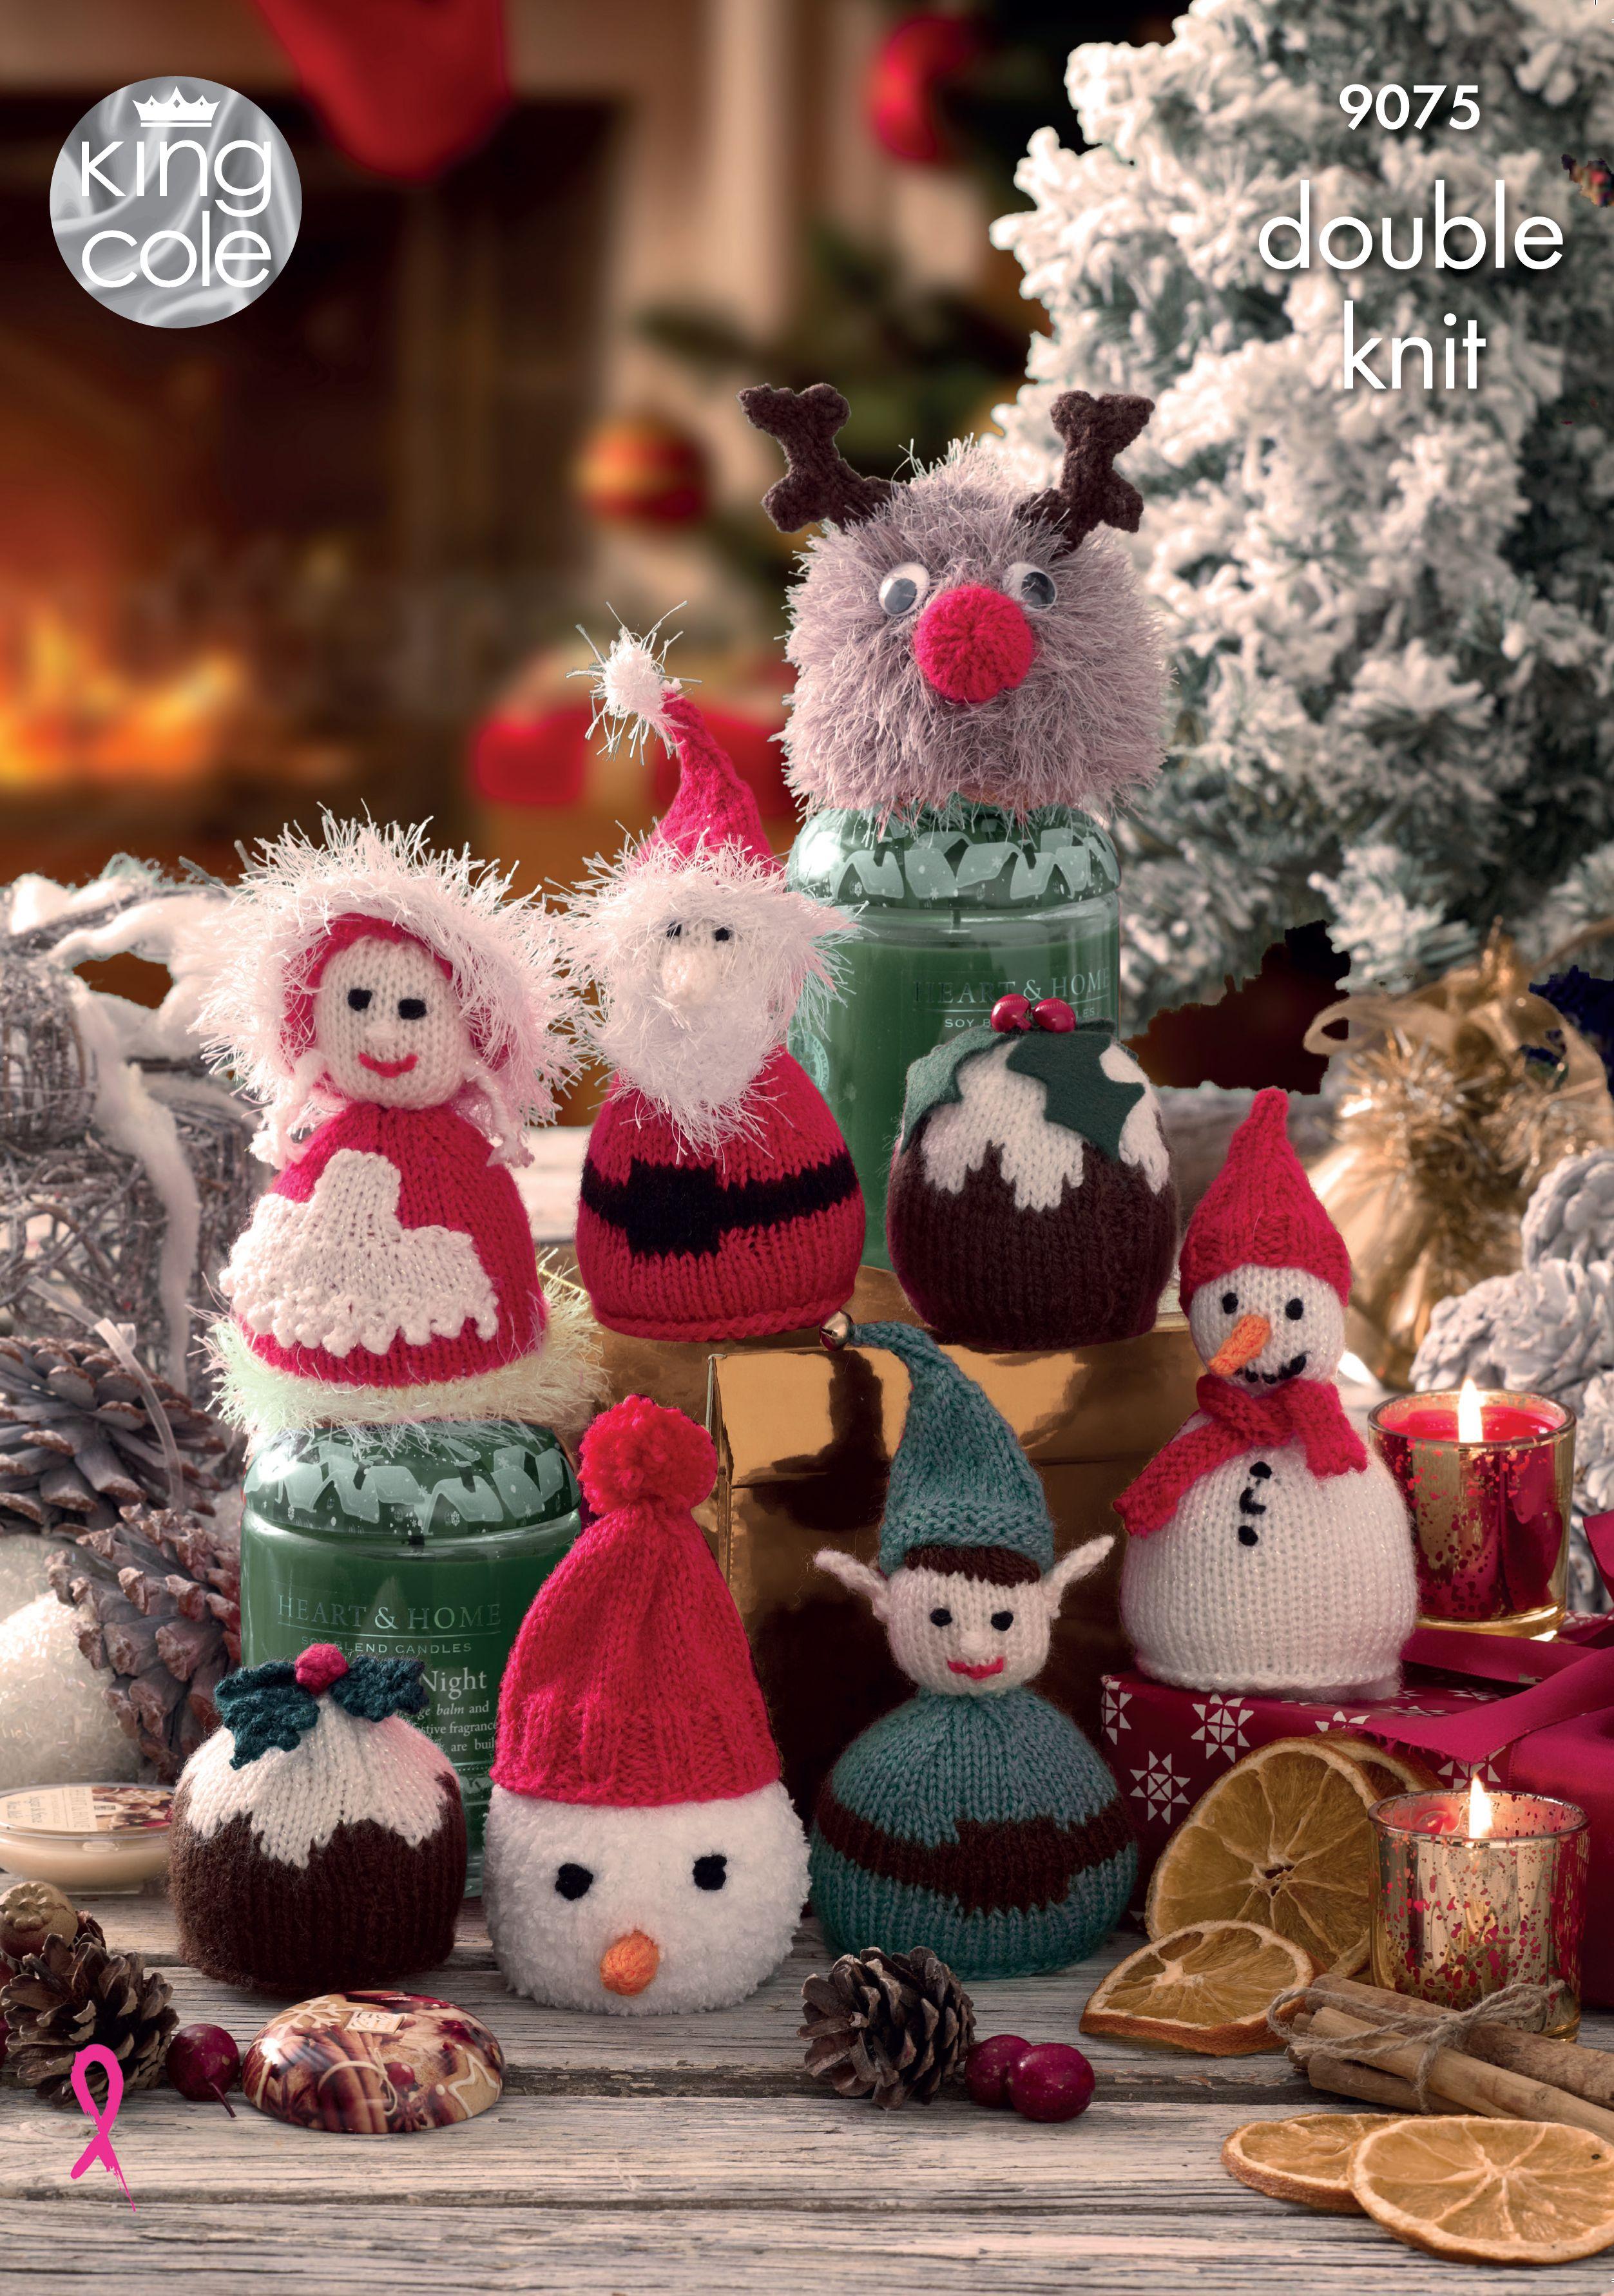 Rudolph and stocking knitting pattern 8002 Christmas novelties Santa snowman